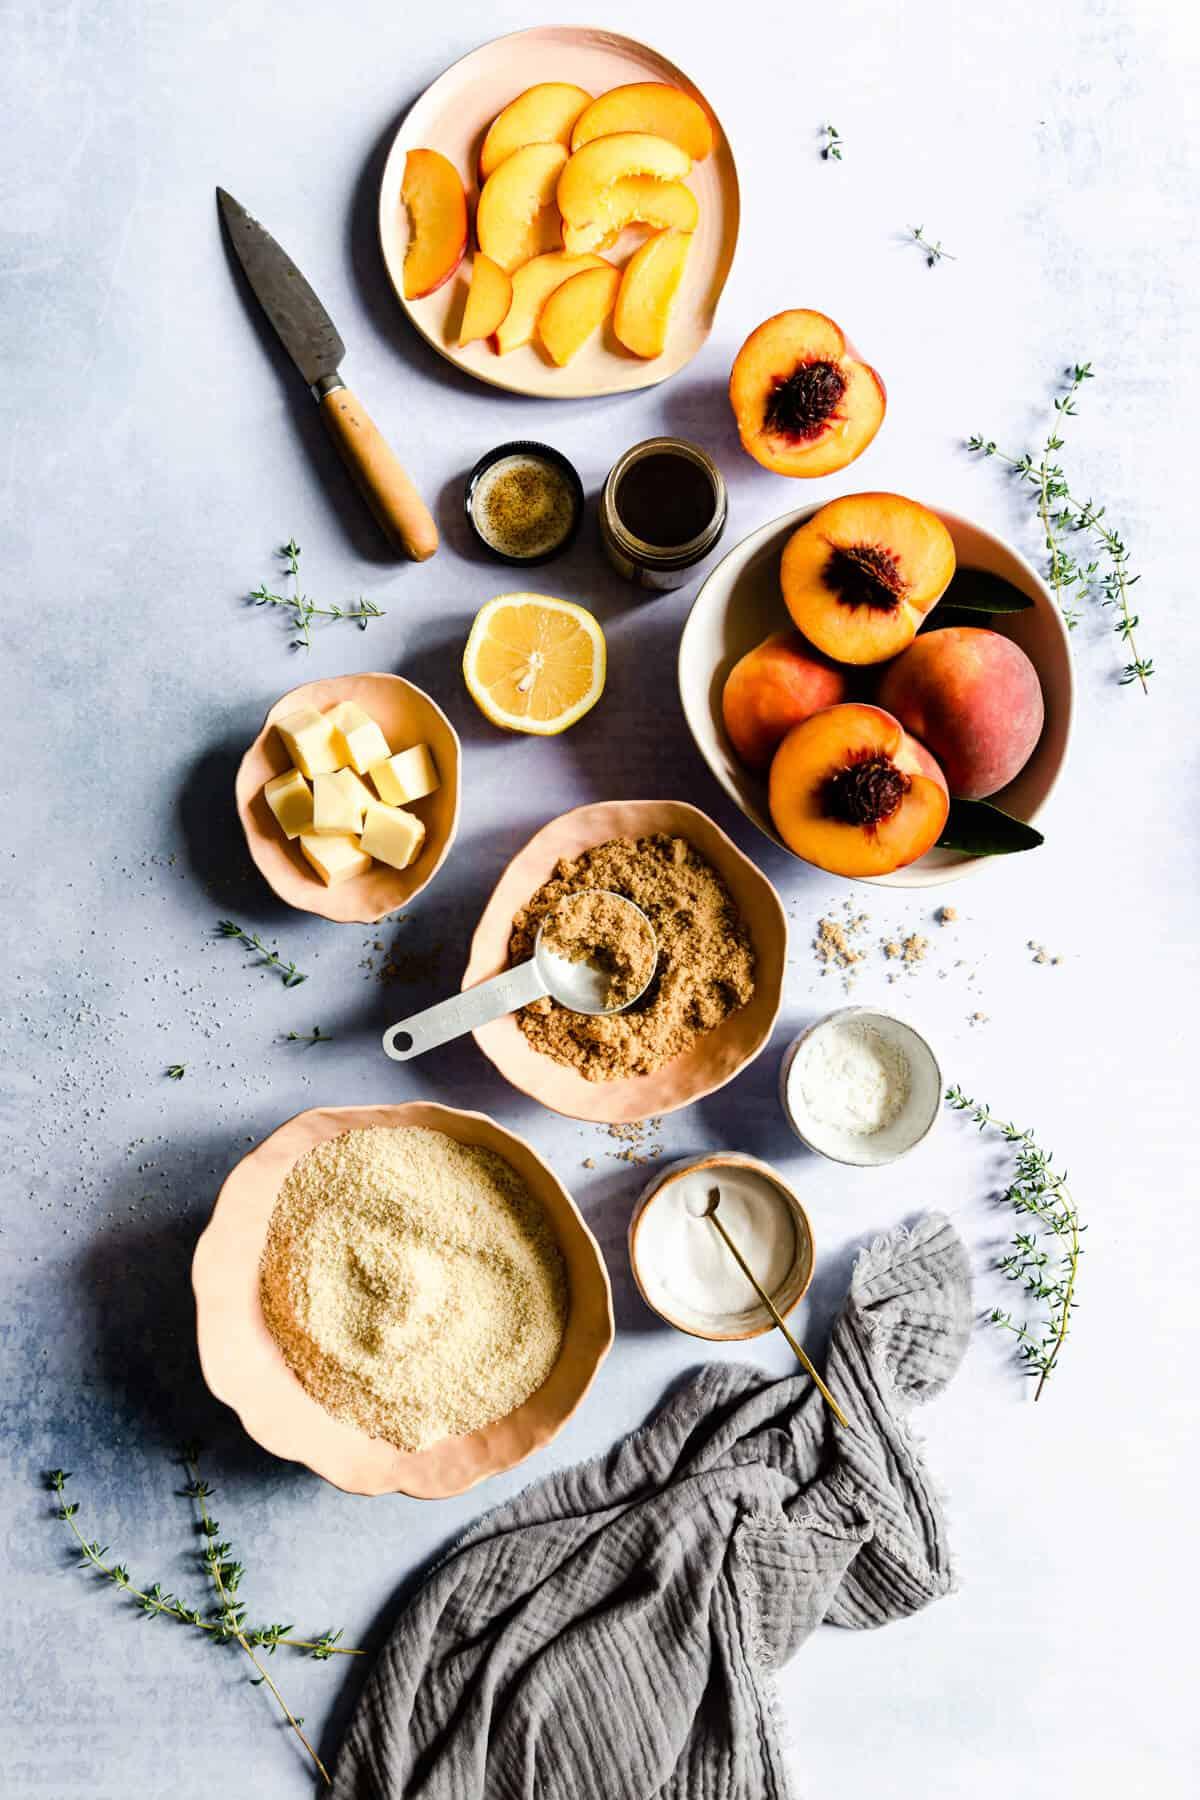 top view of peach galette ingredients